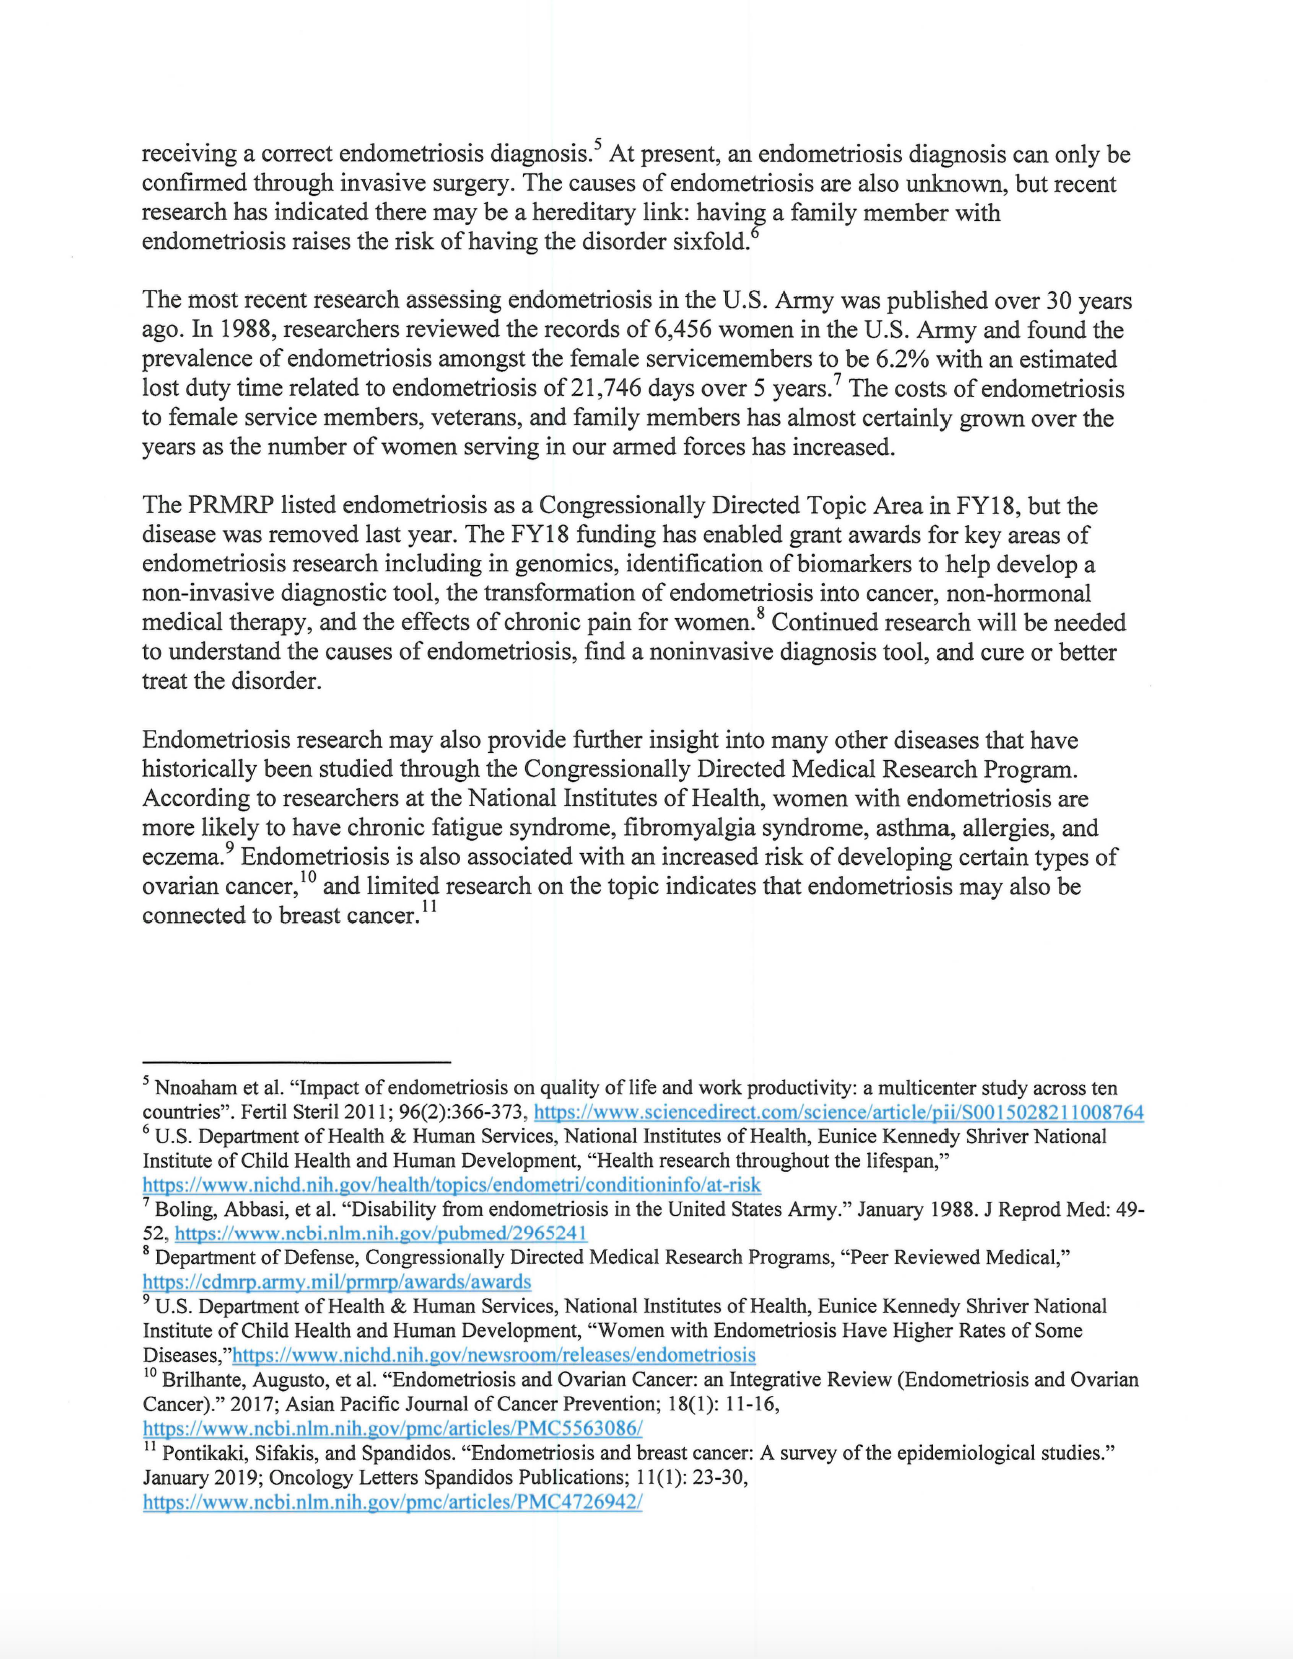 Warren Romney Letter 2.png